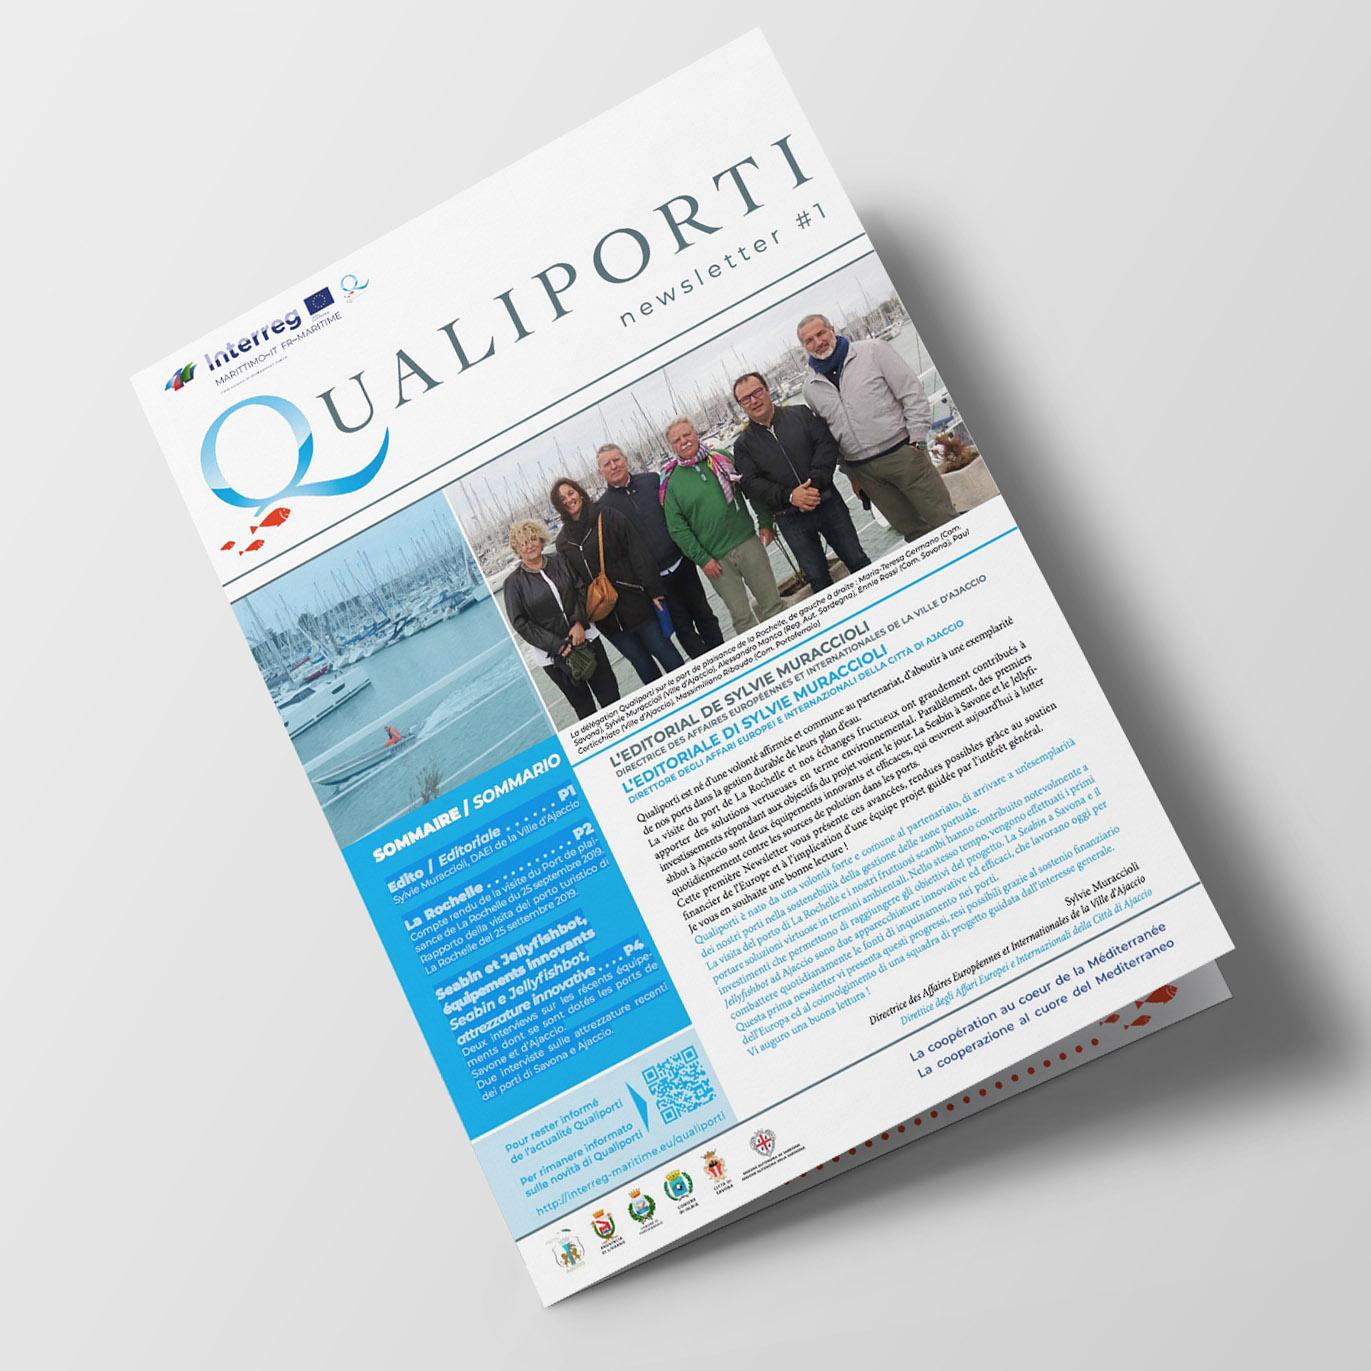 QUALIPORTI - Newsletter #1